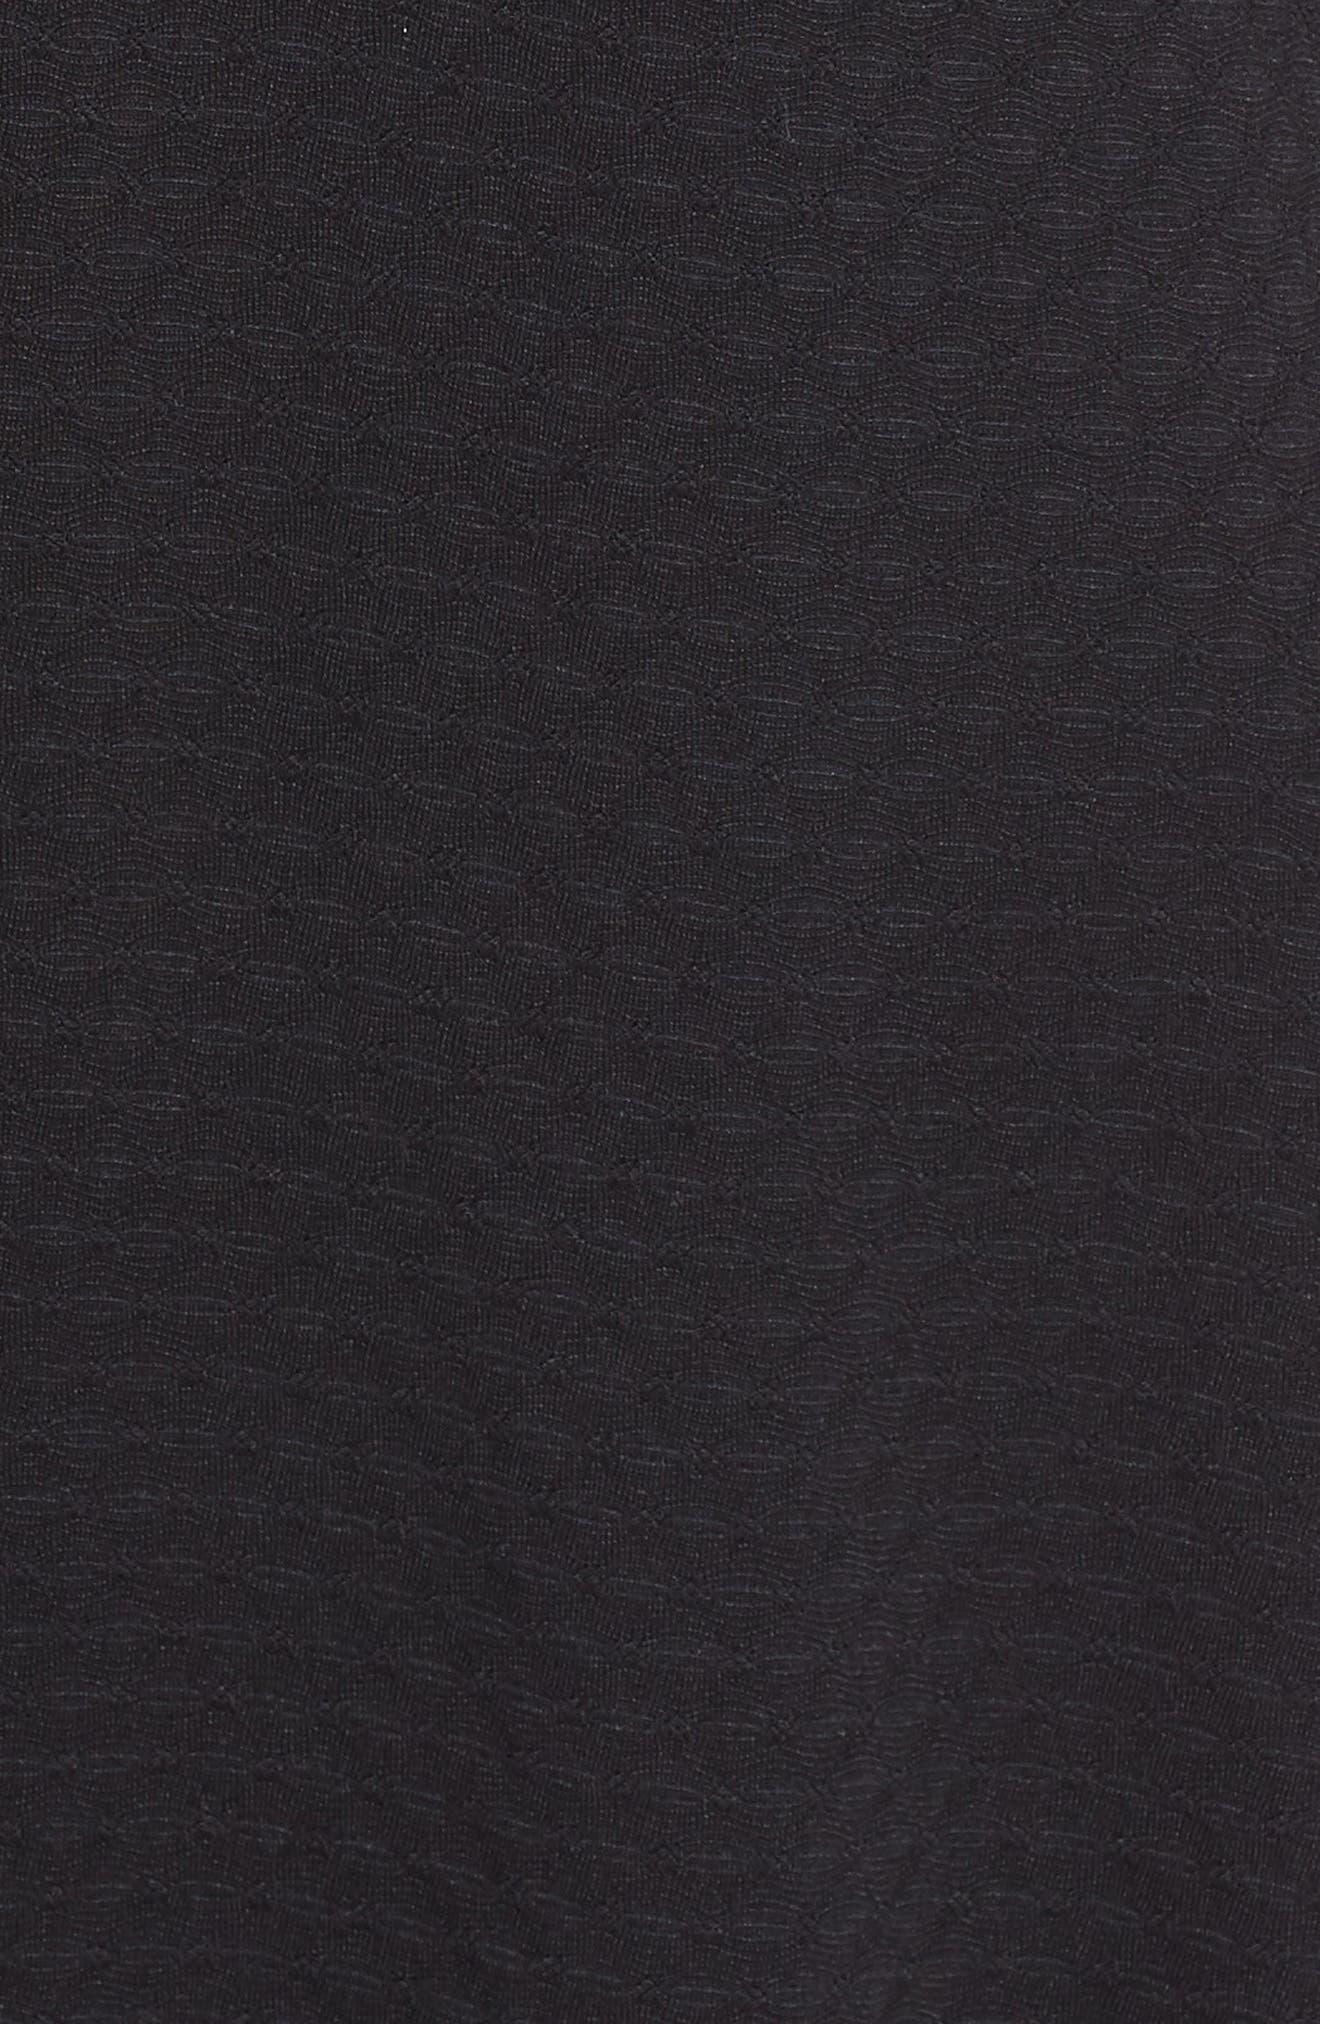 ALI & JAY, Fly Baby Dress, Alternate thumbnail 6, color, BLACK